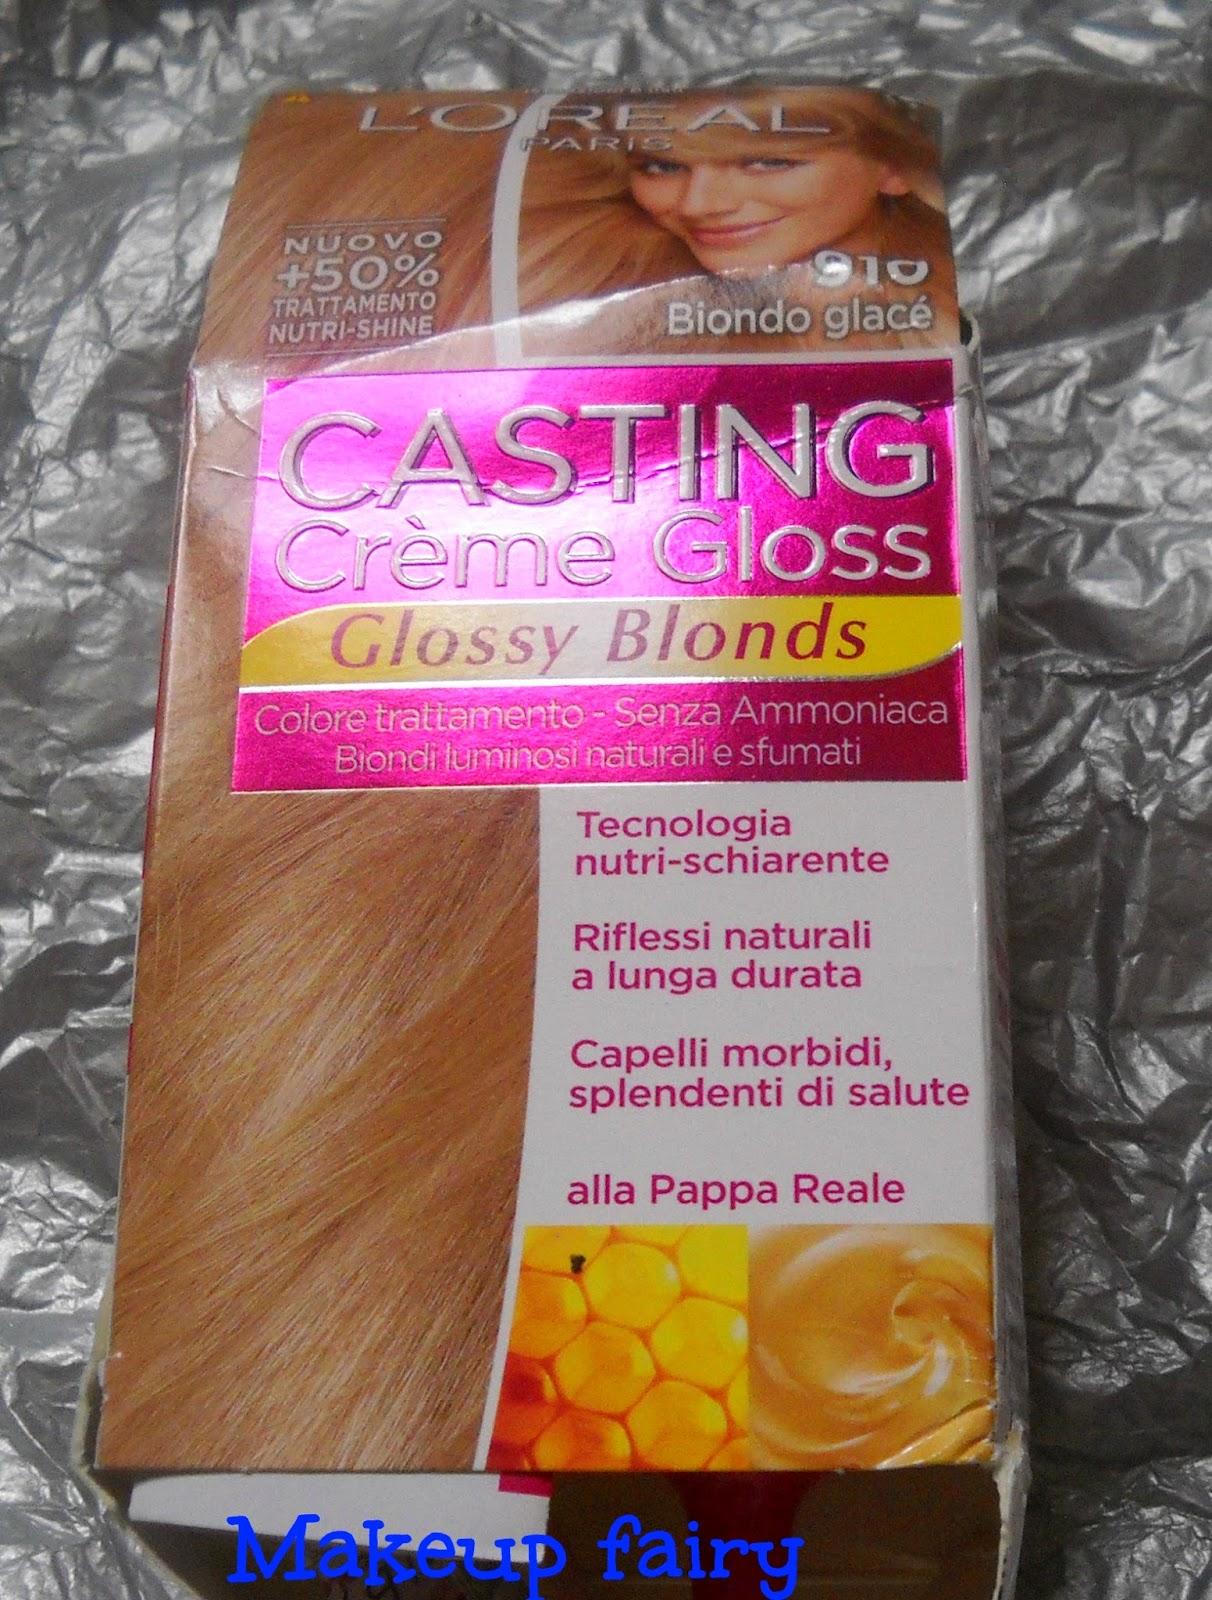 Tinklesmakeup  L oreal casting crème gloss   coloriamo insieme i ... 4b6c58f297e4